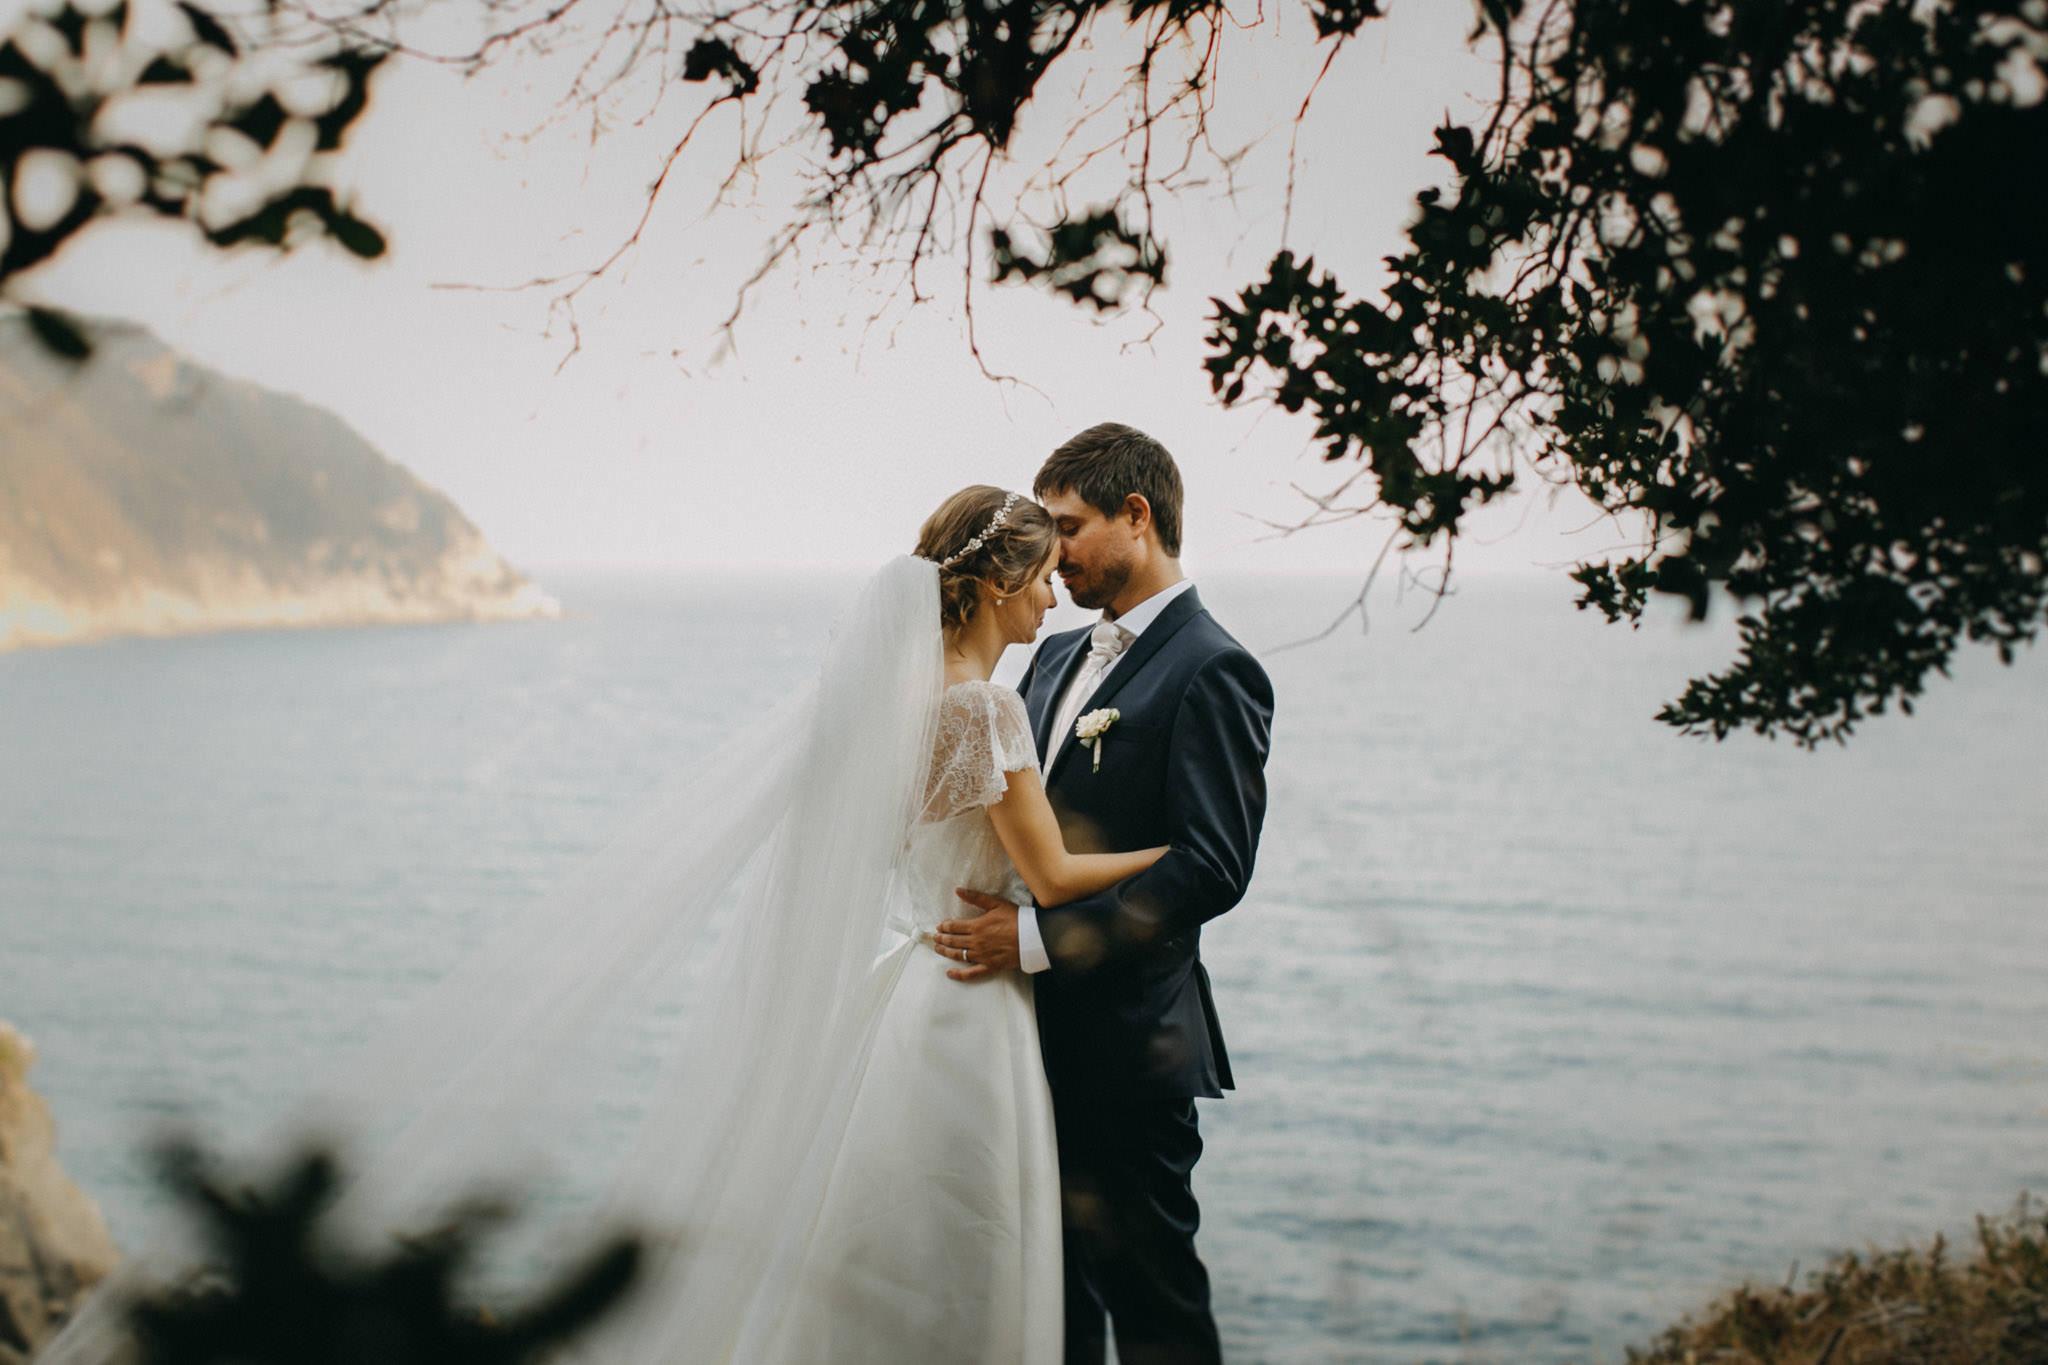 fotografia_di_matrimonio_portfolio-1004